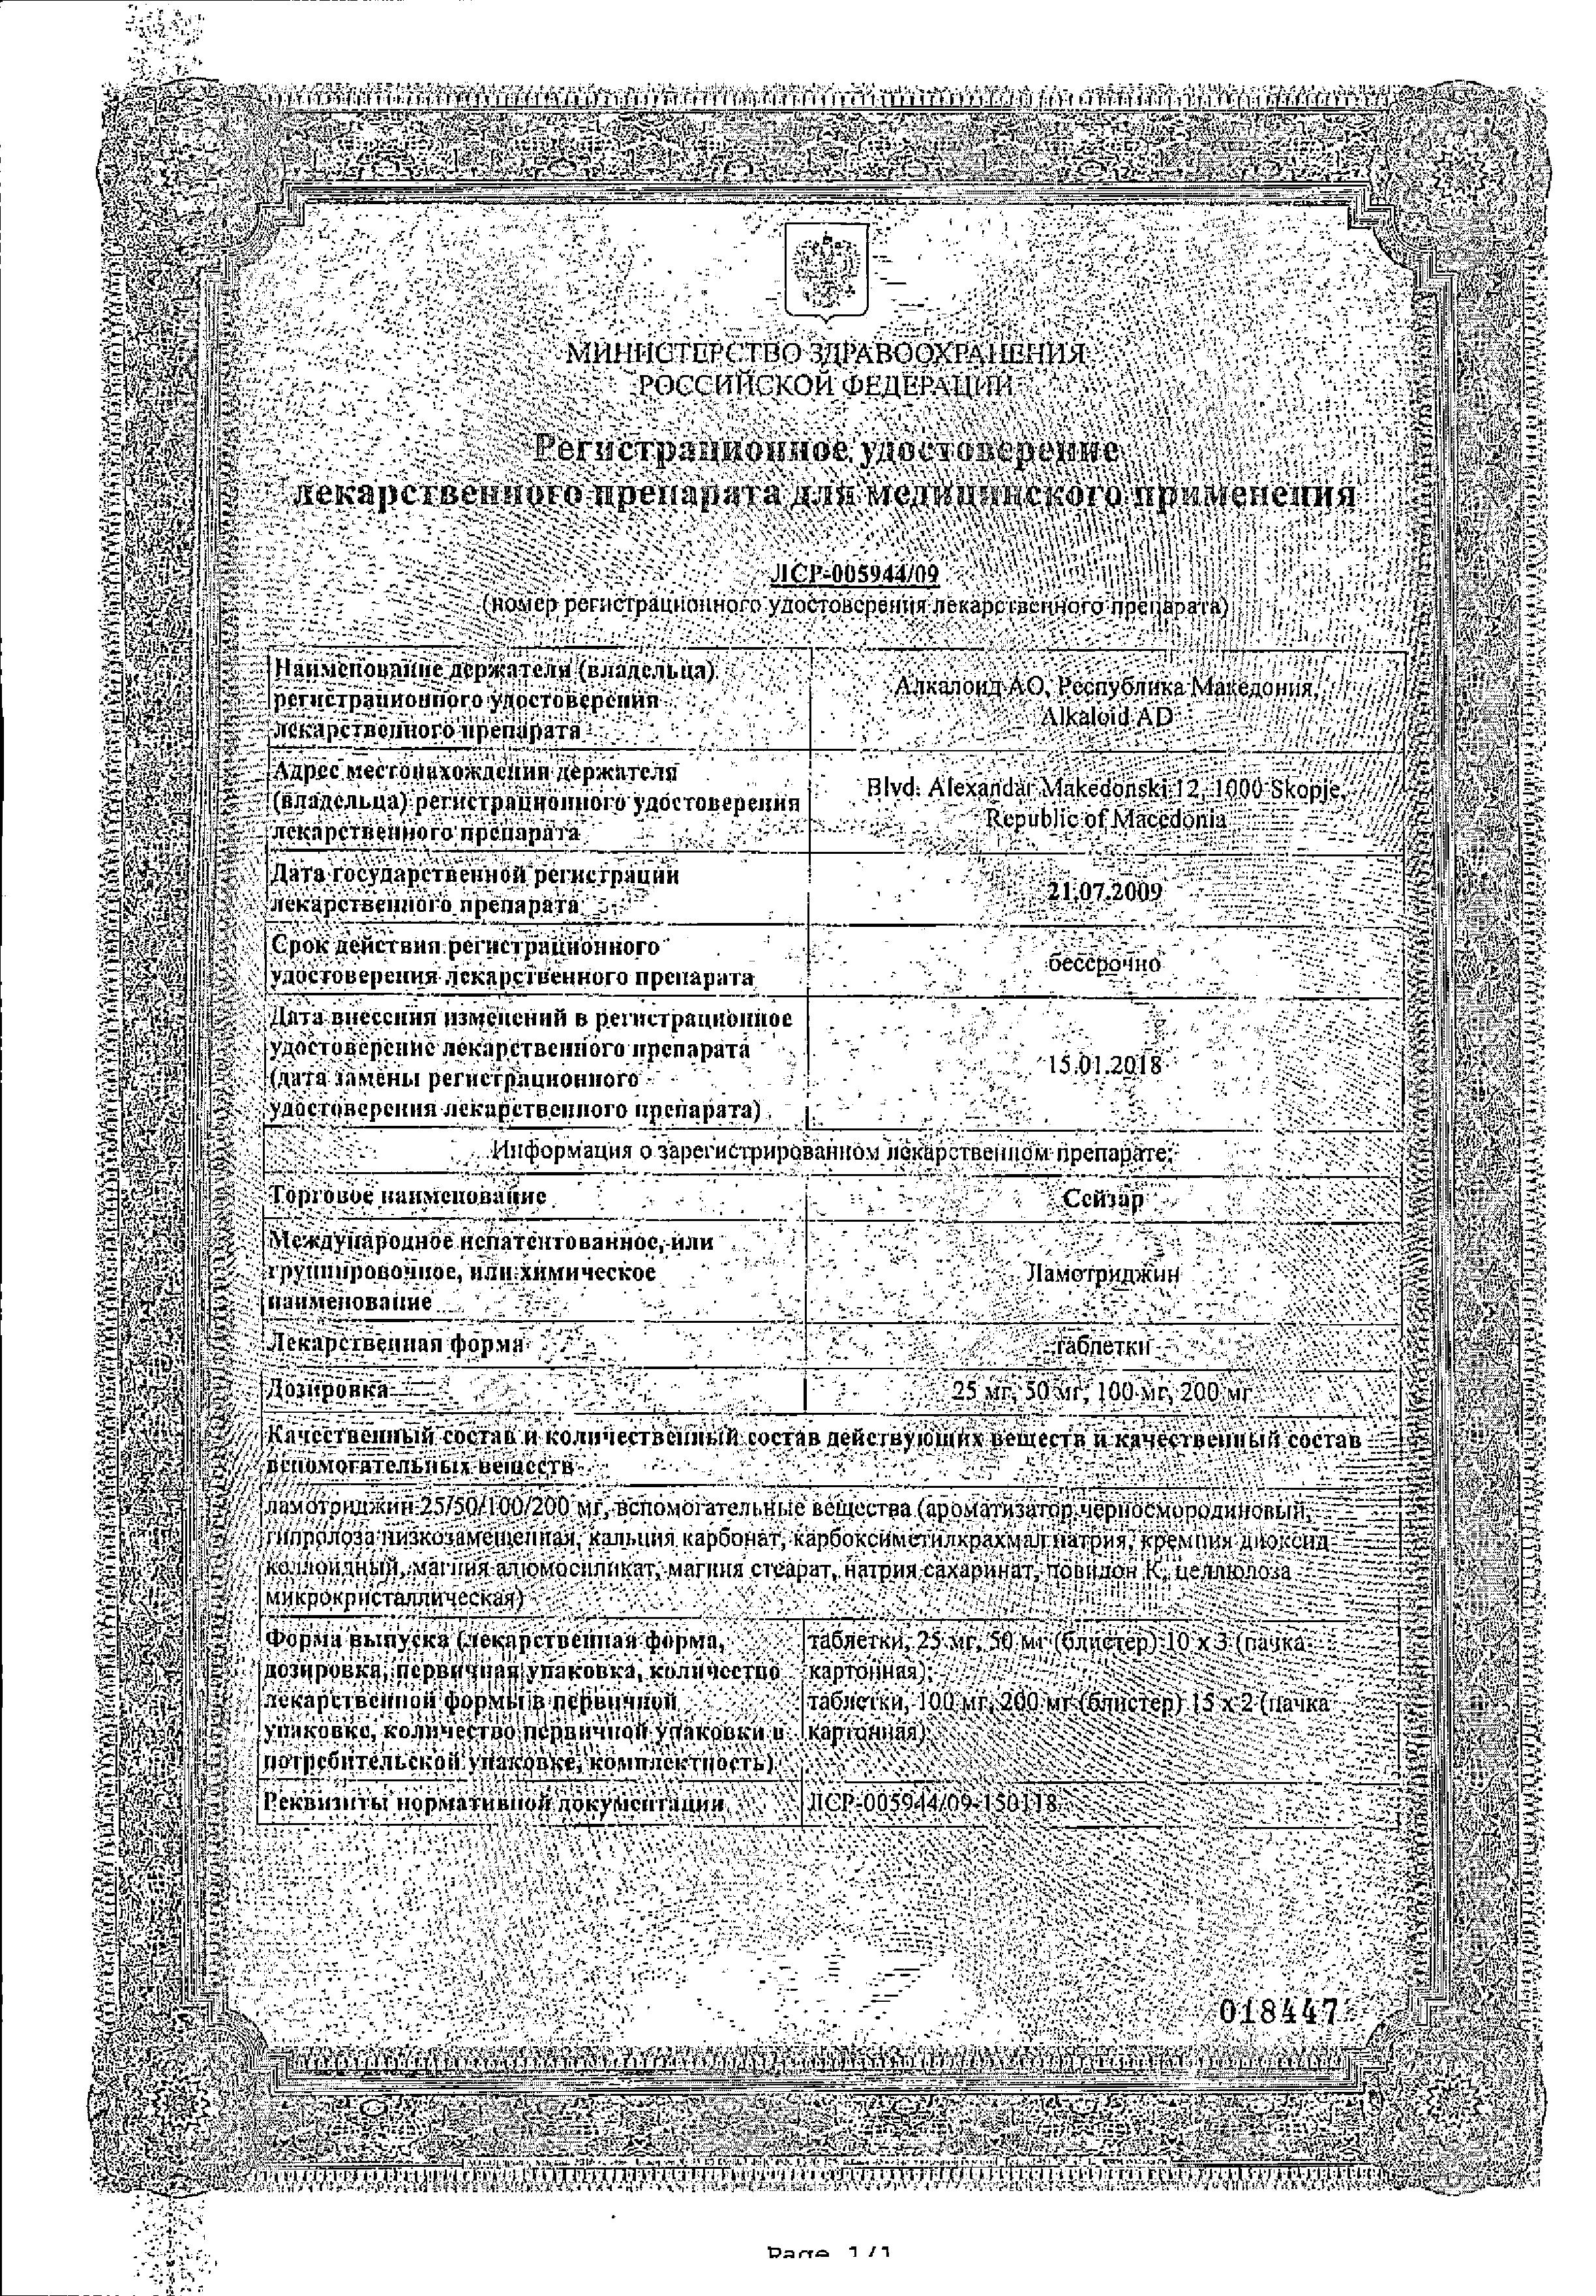 Сейзар сертификат